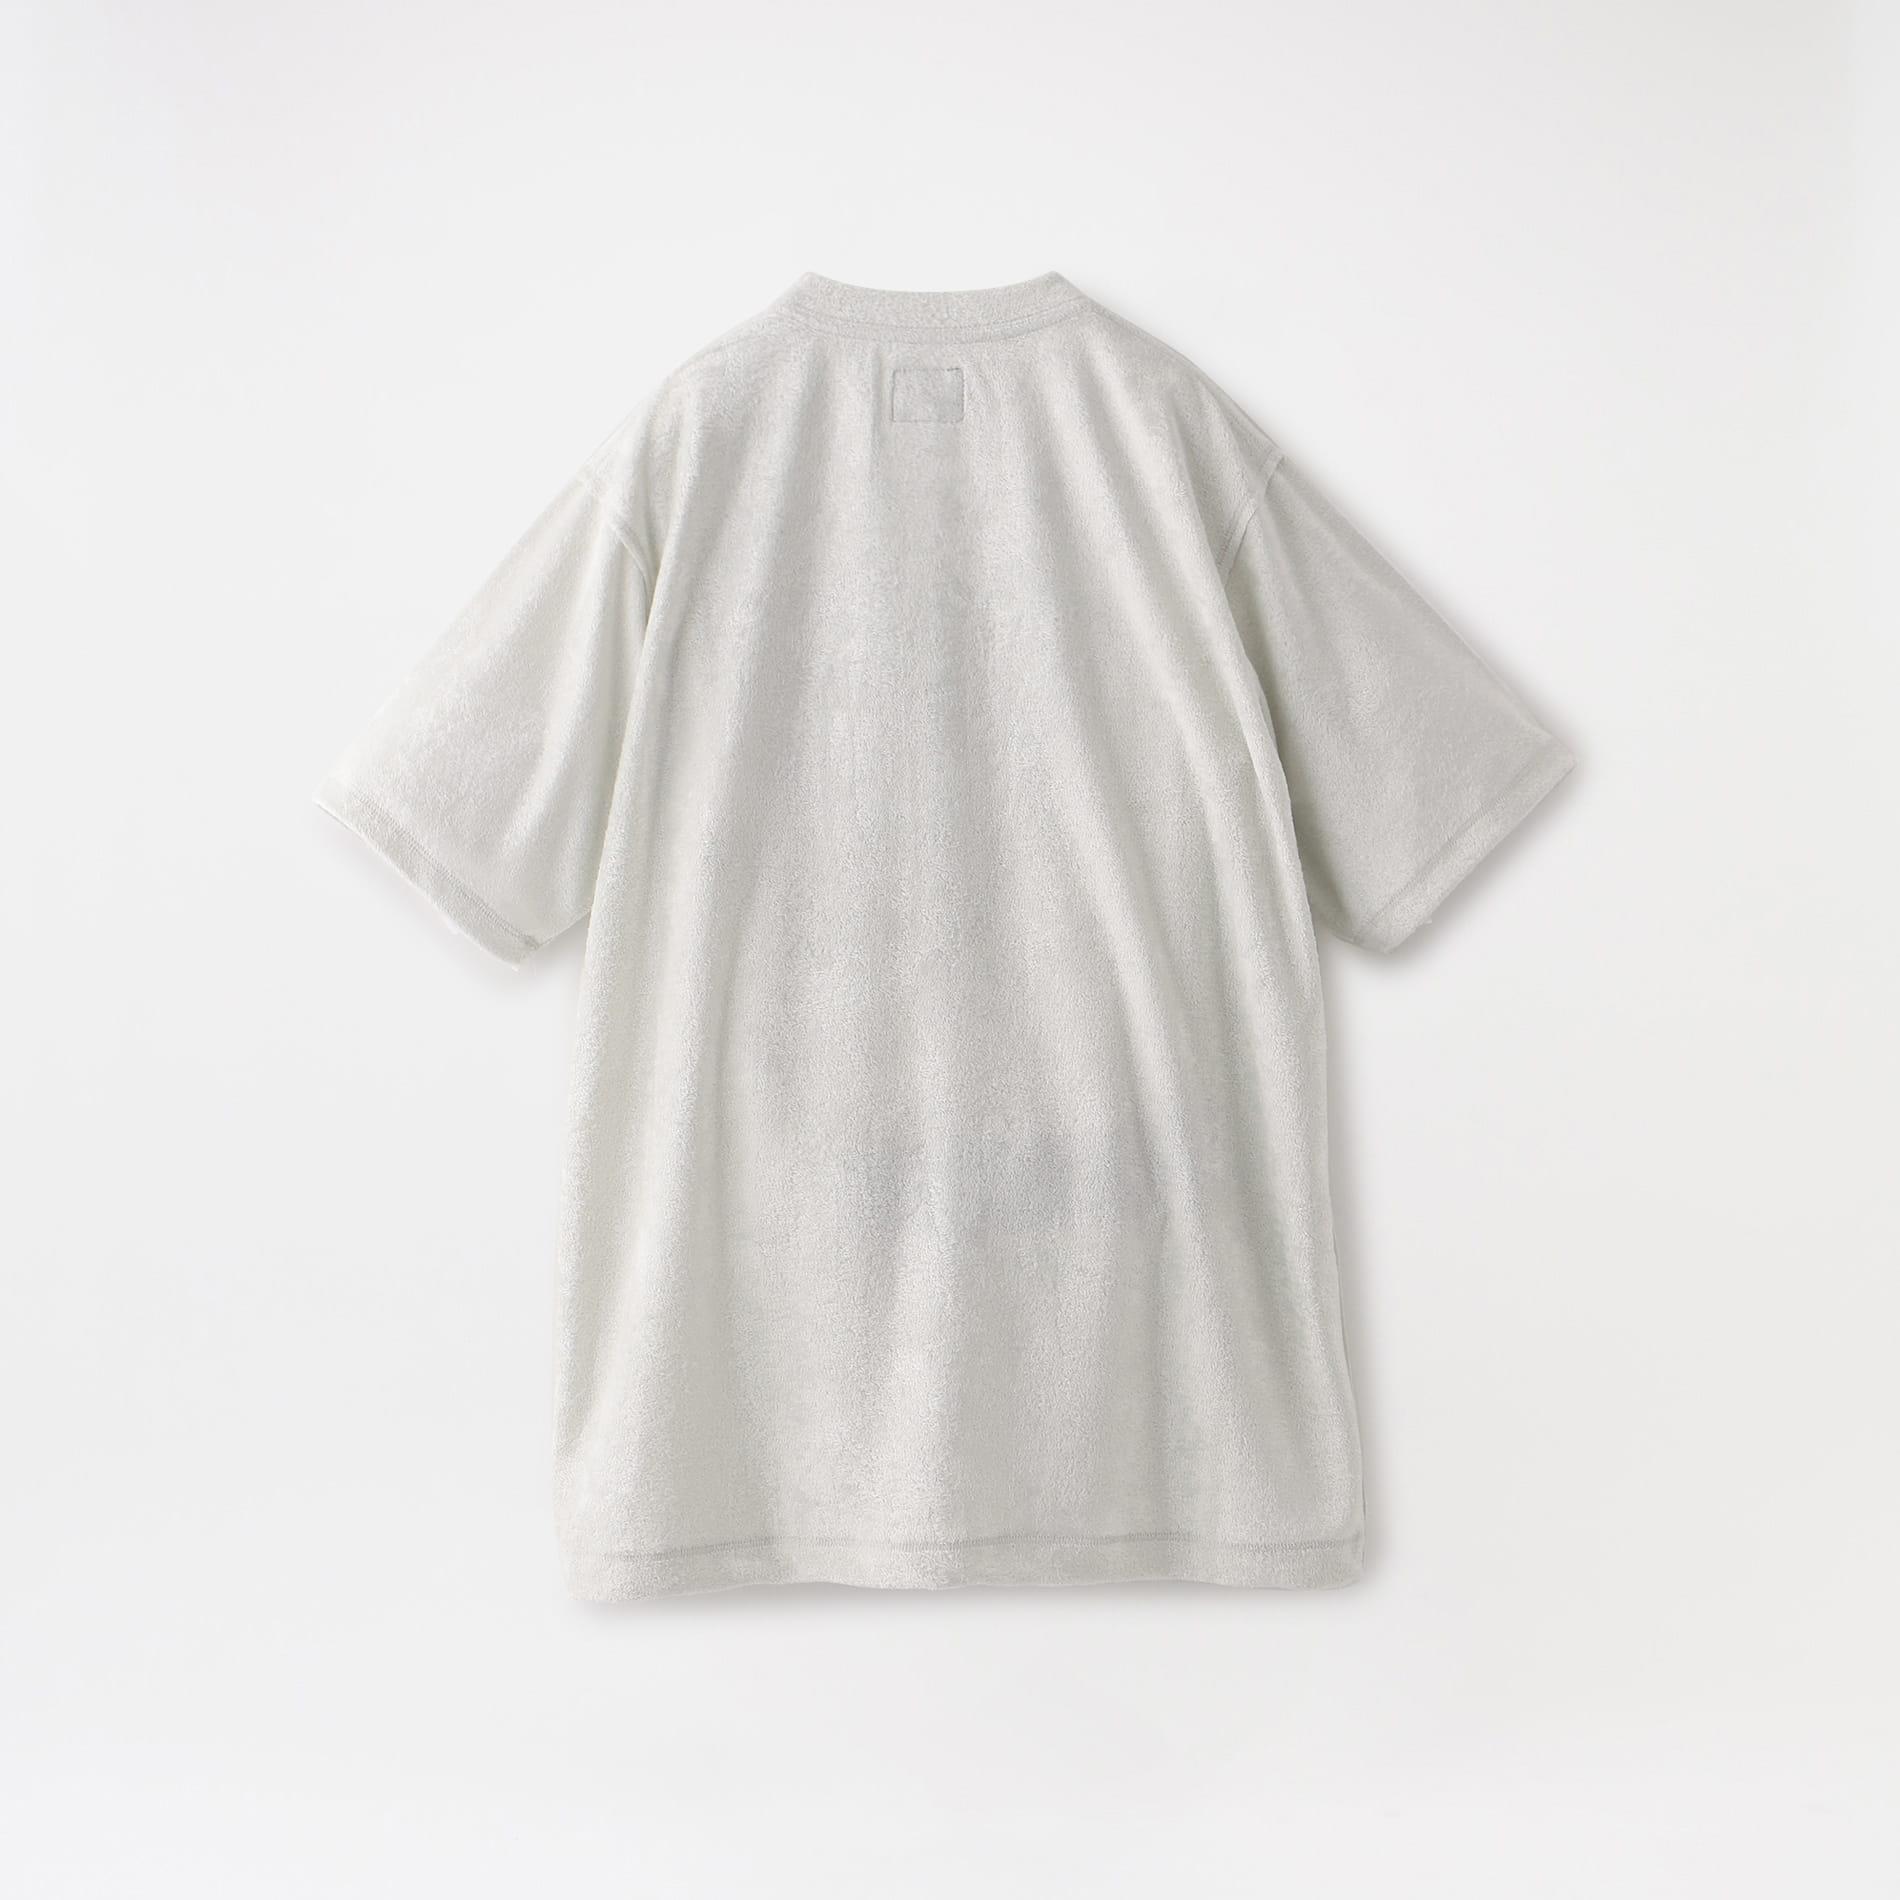 【Needles】WOMEN S/S Papillon Emb.  Pocket Tee - R/Pe Velour GL253